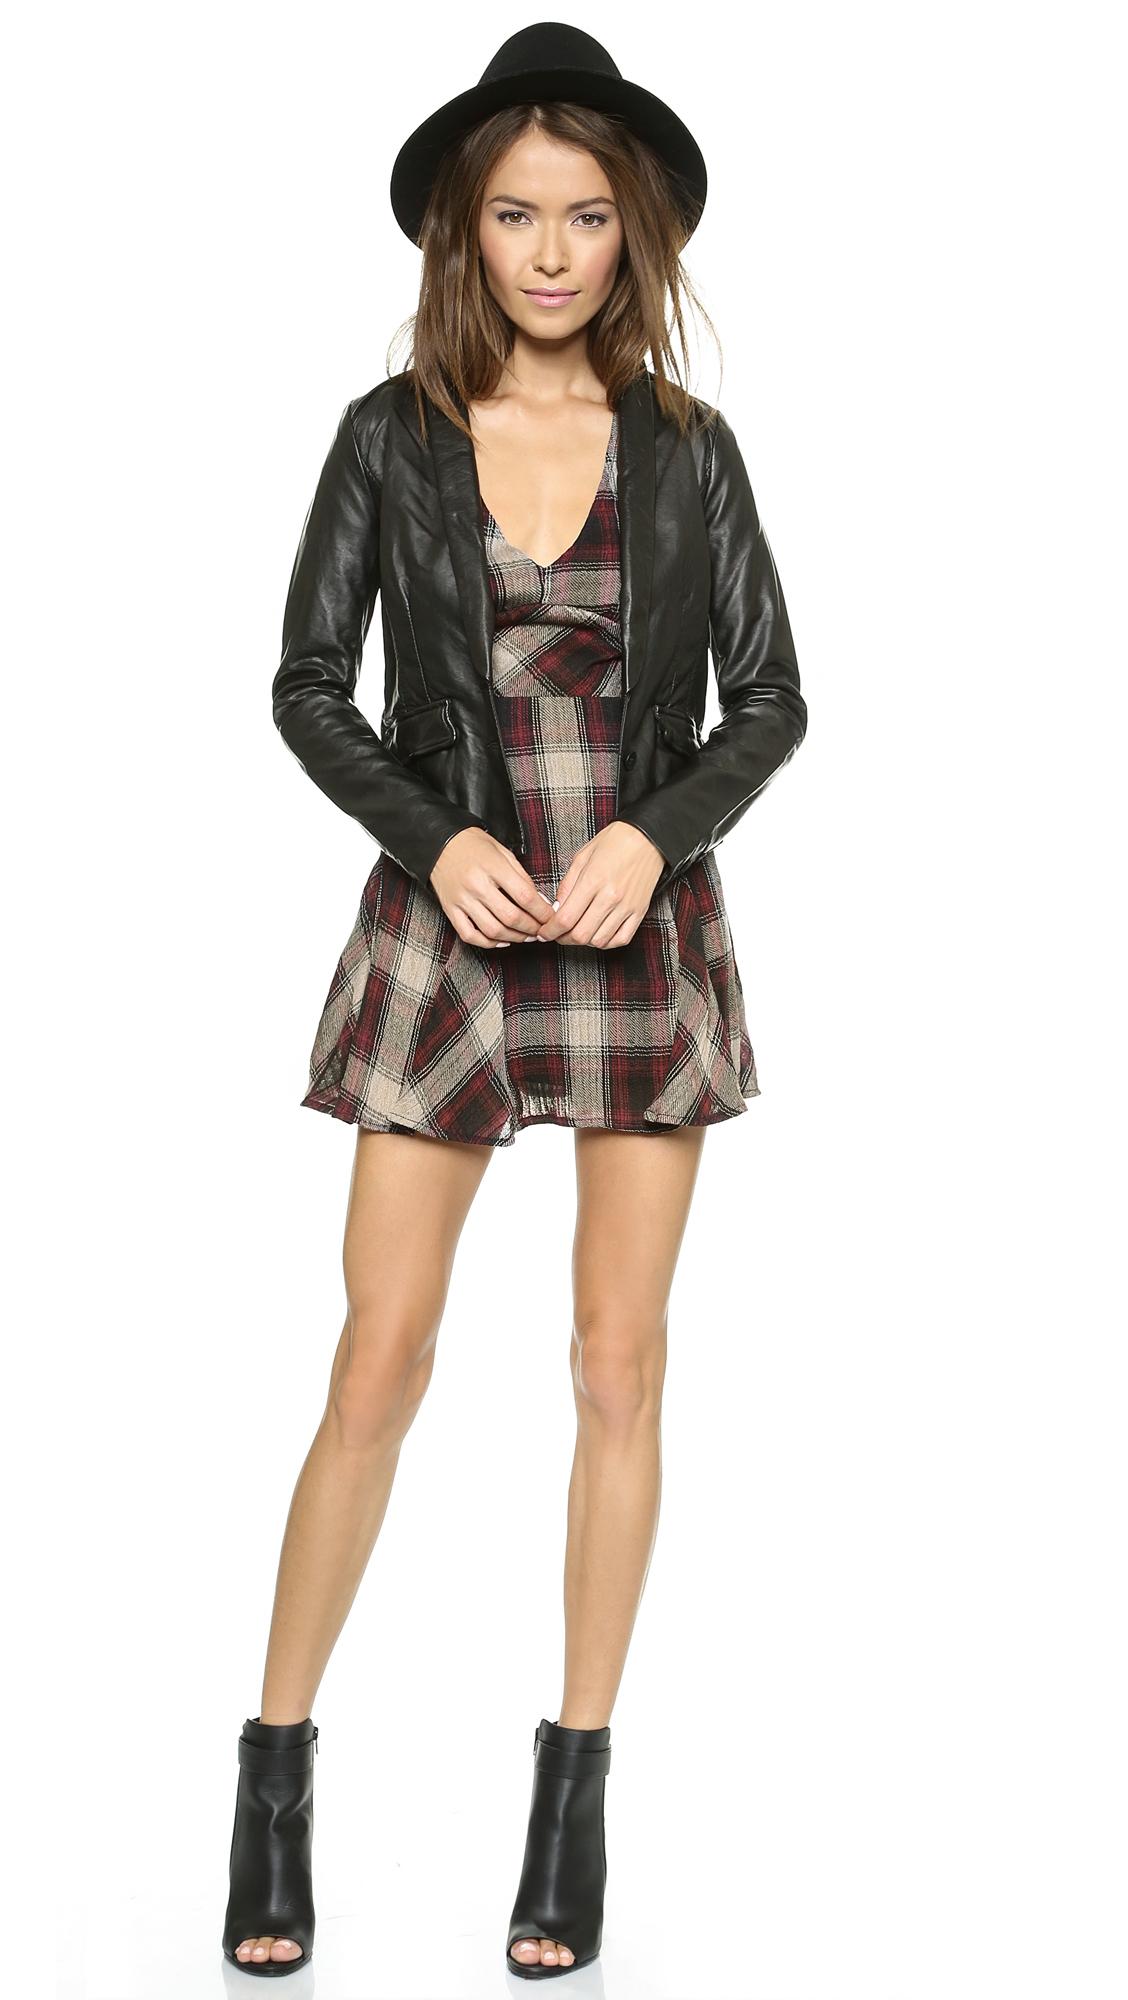 Free People Teen Spirit Mini Dress Washed Black - Lyst-8026